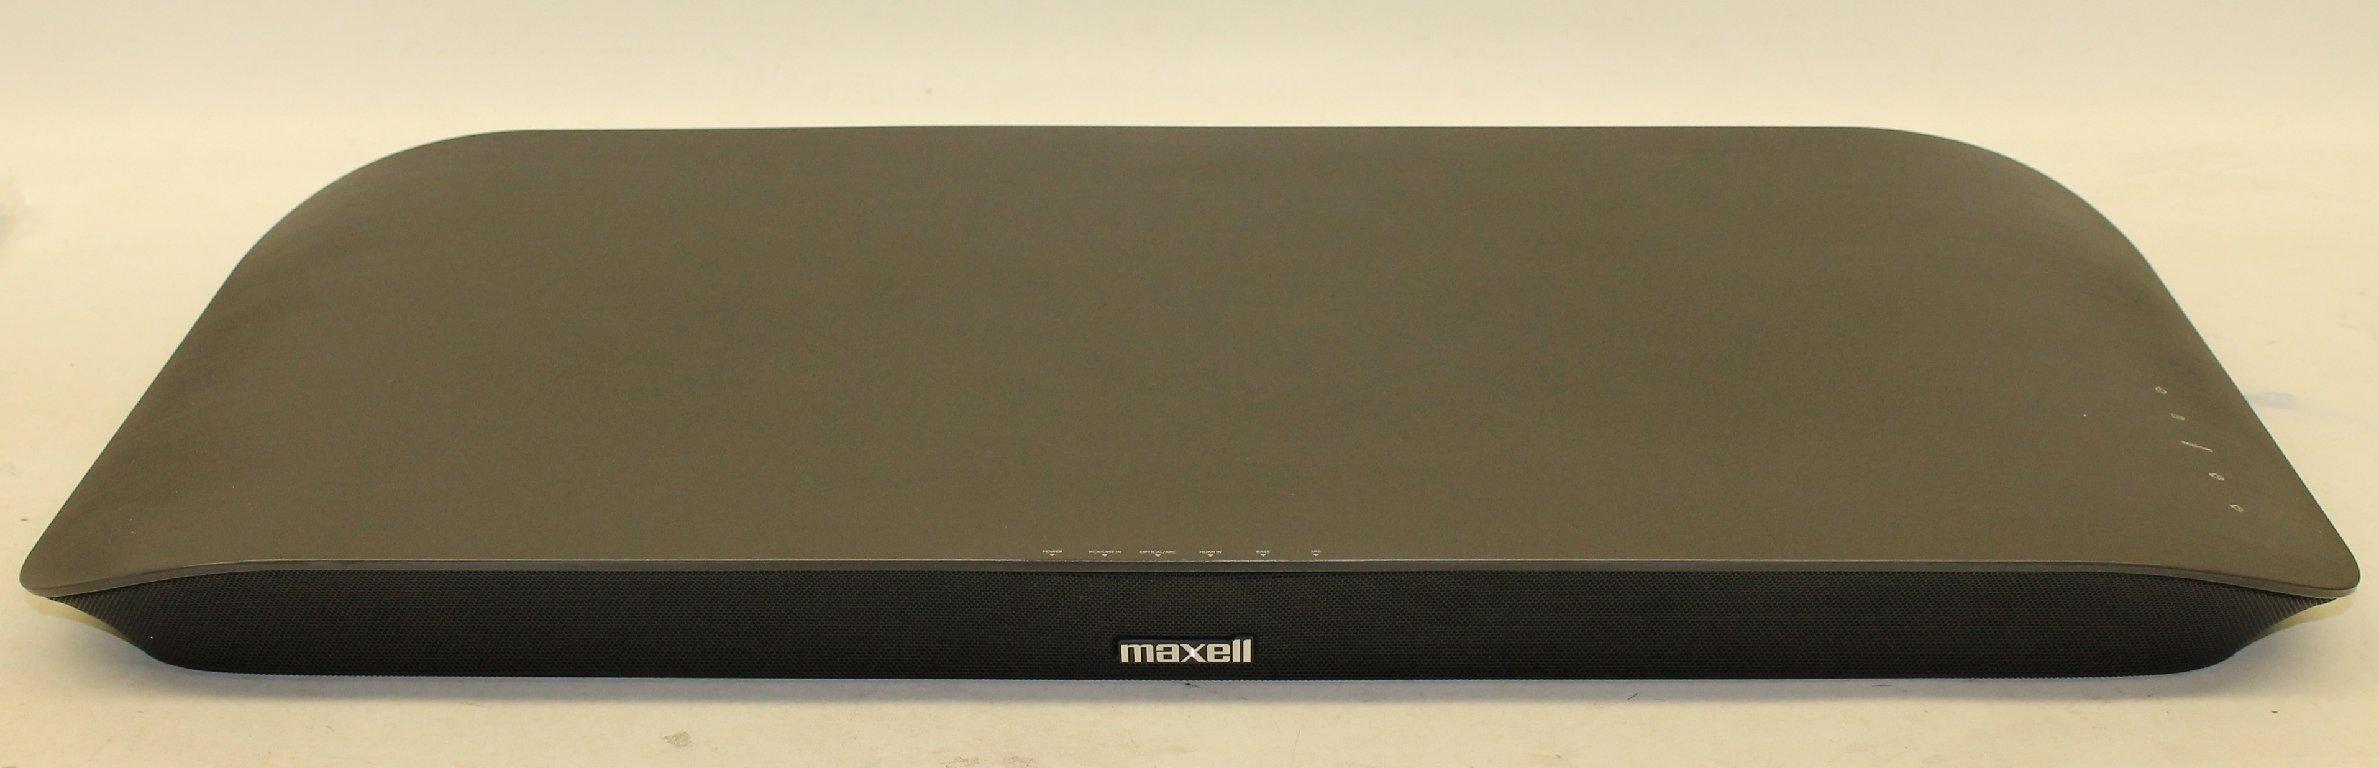 Maxell-MXSB-252-Surround-Soundbar-Lautsprecher-70-Watt-RMS-HDMI-schwarz